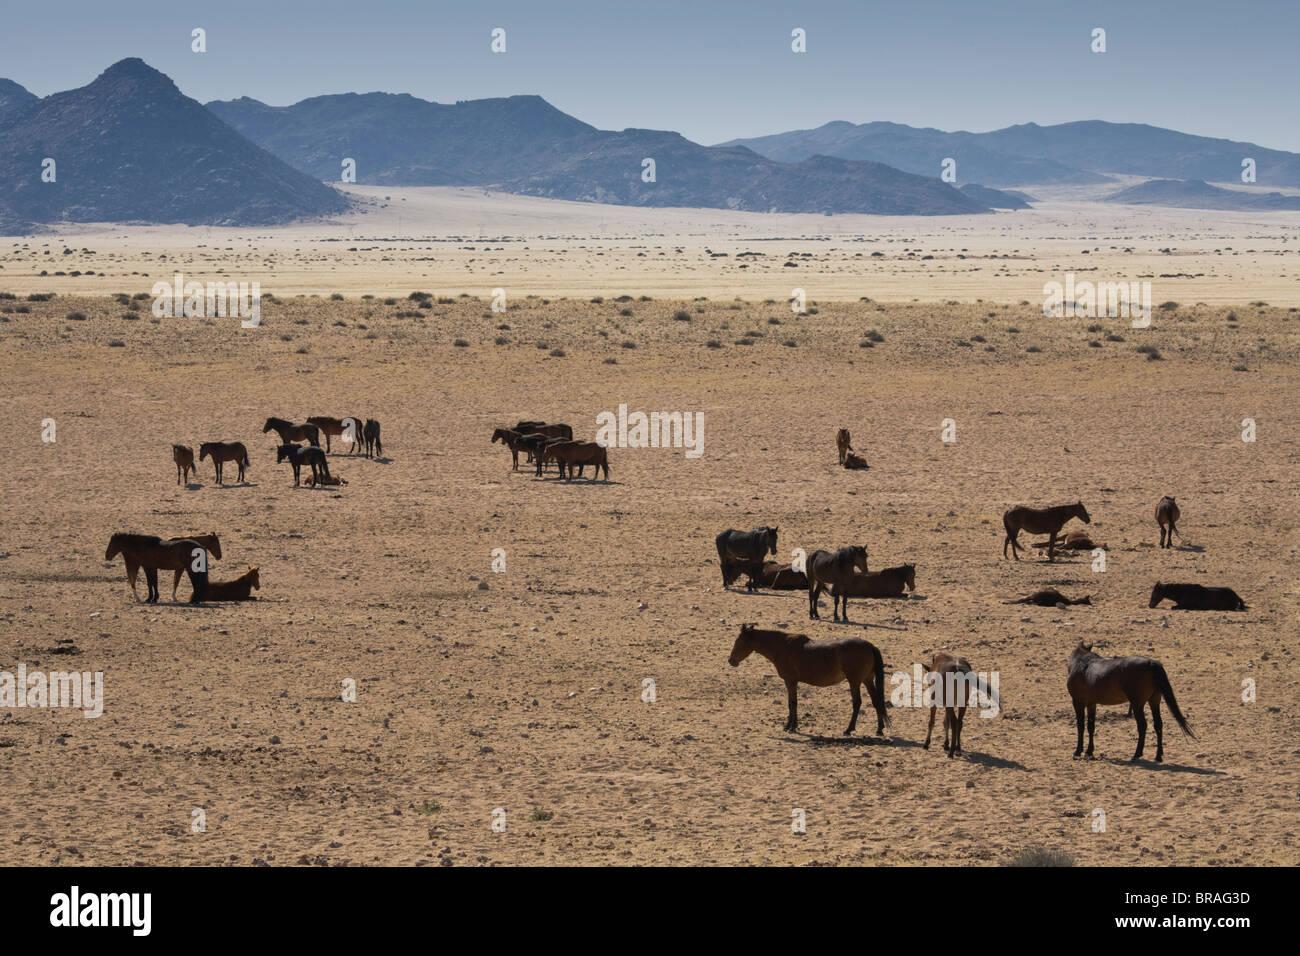 Wild horses, near Aus, Namib Desert, Namibia, Africa - Stock Image